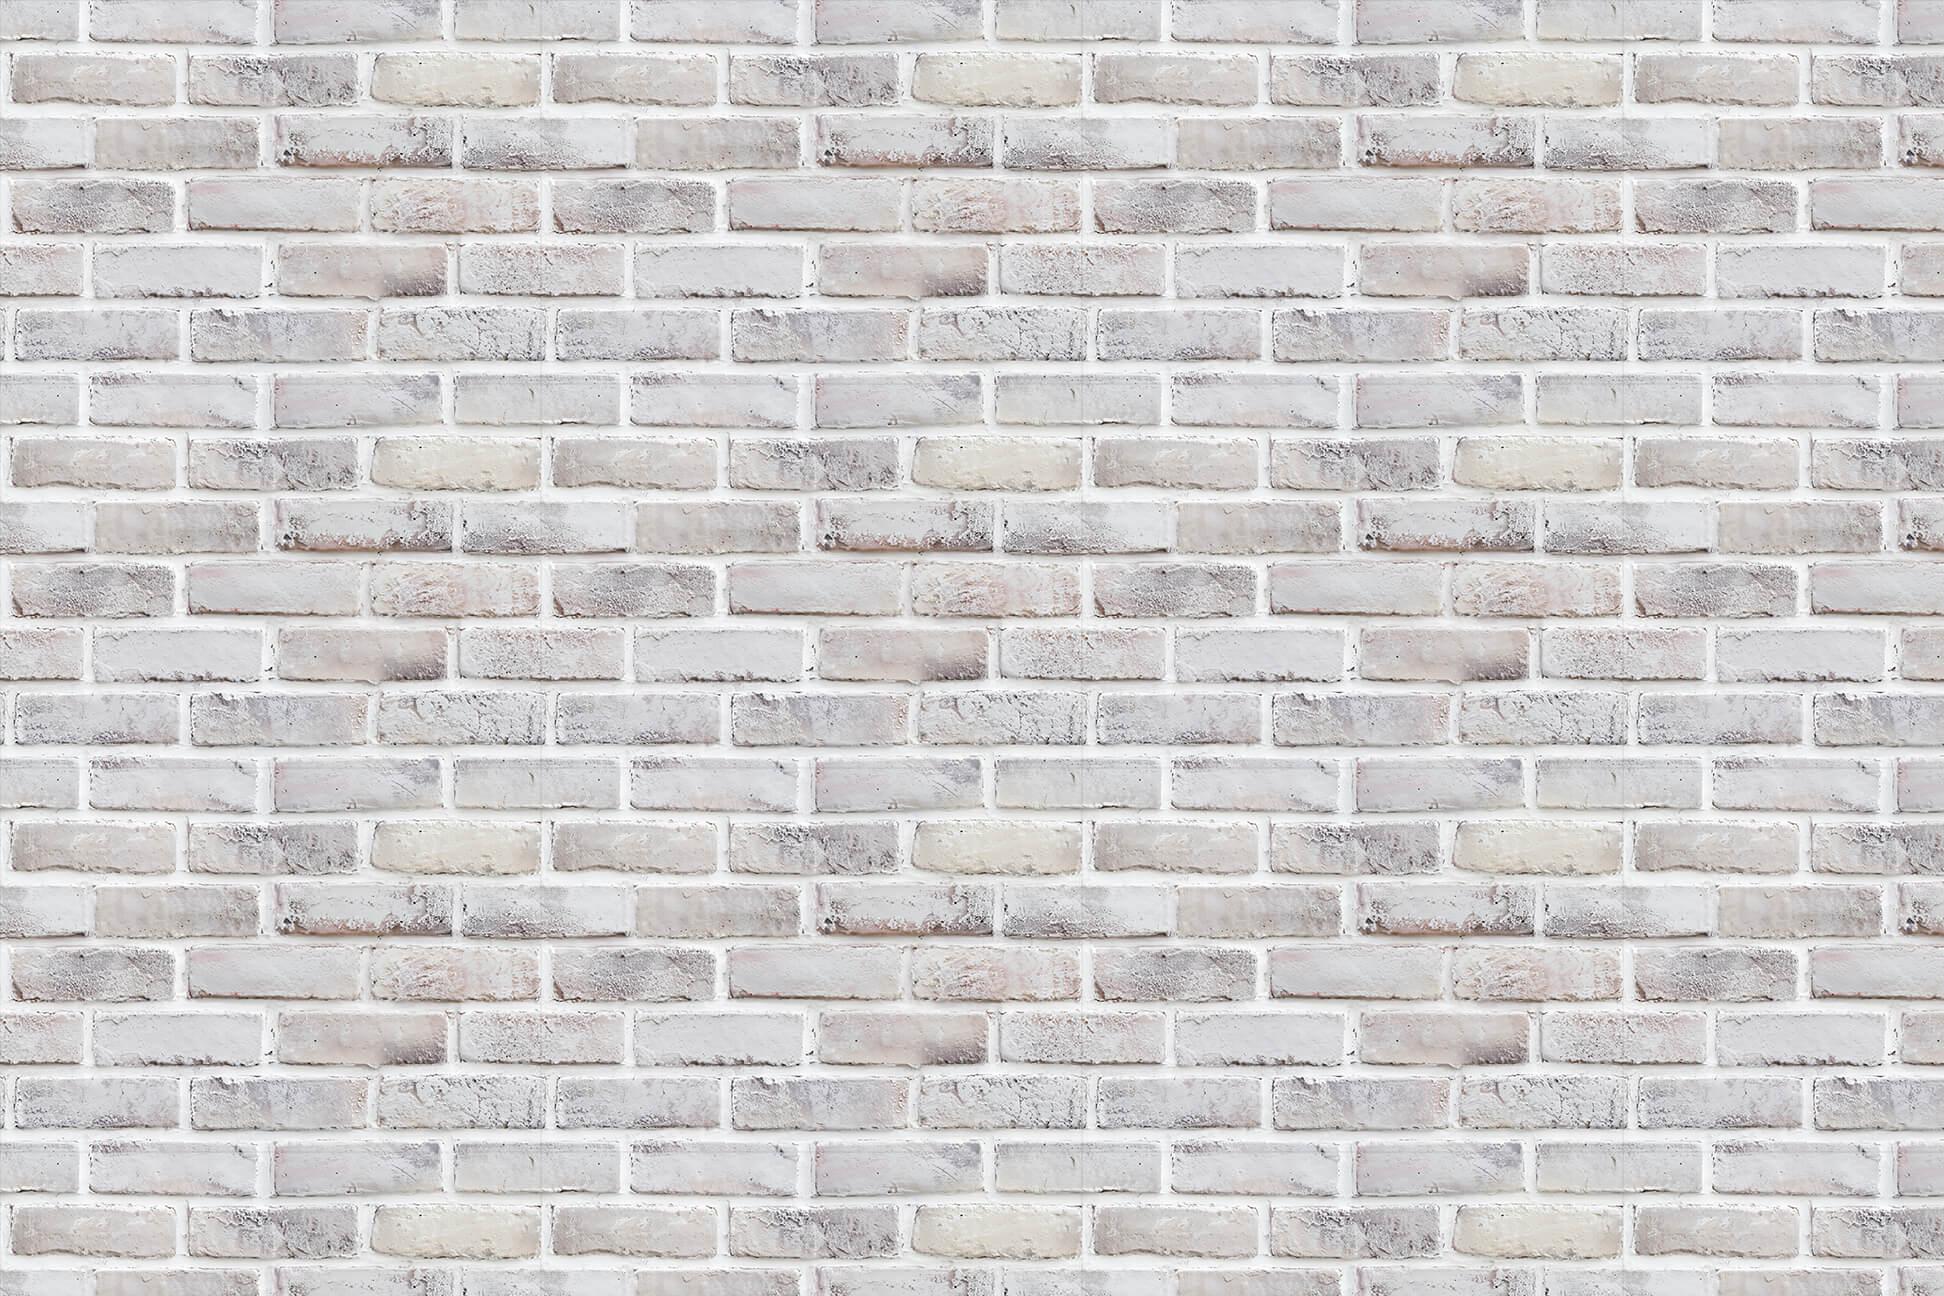 Interior Wallpaper Free Photo Brick Texture Rough Solid Room Free